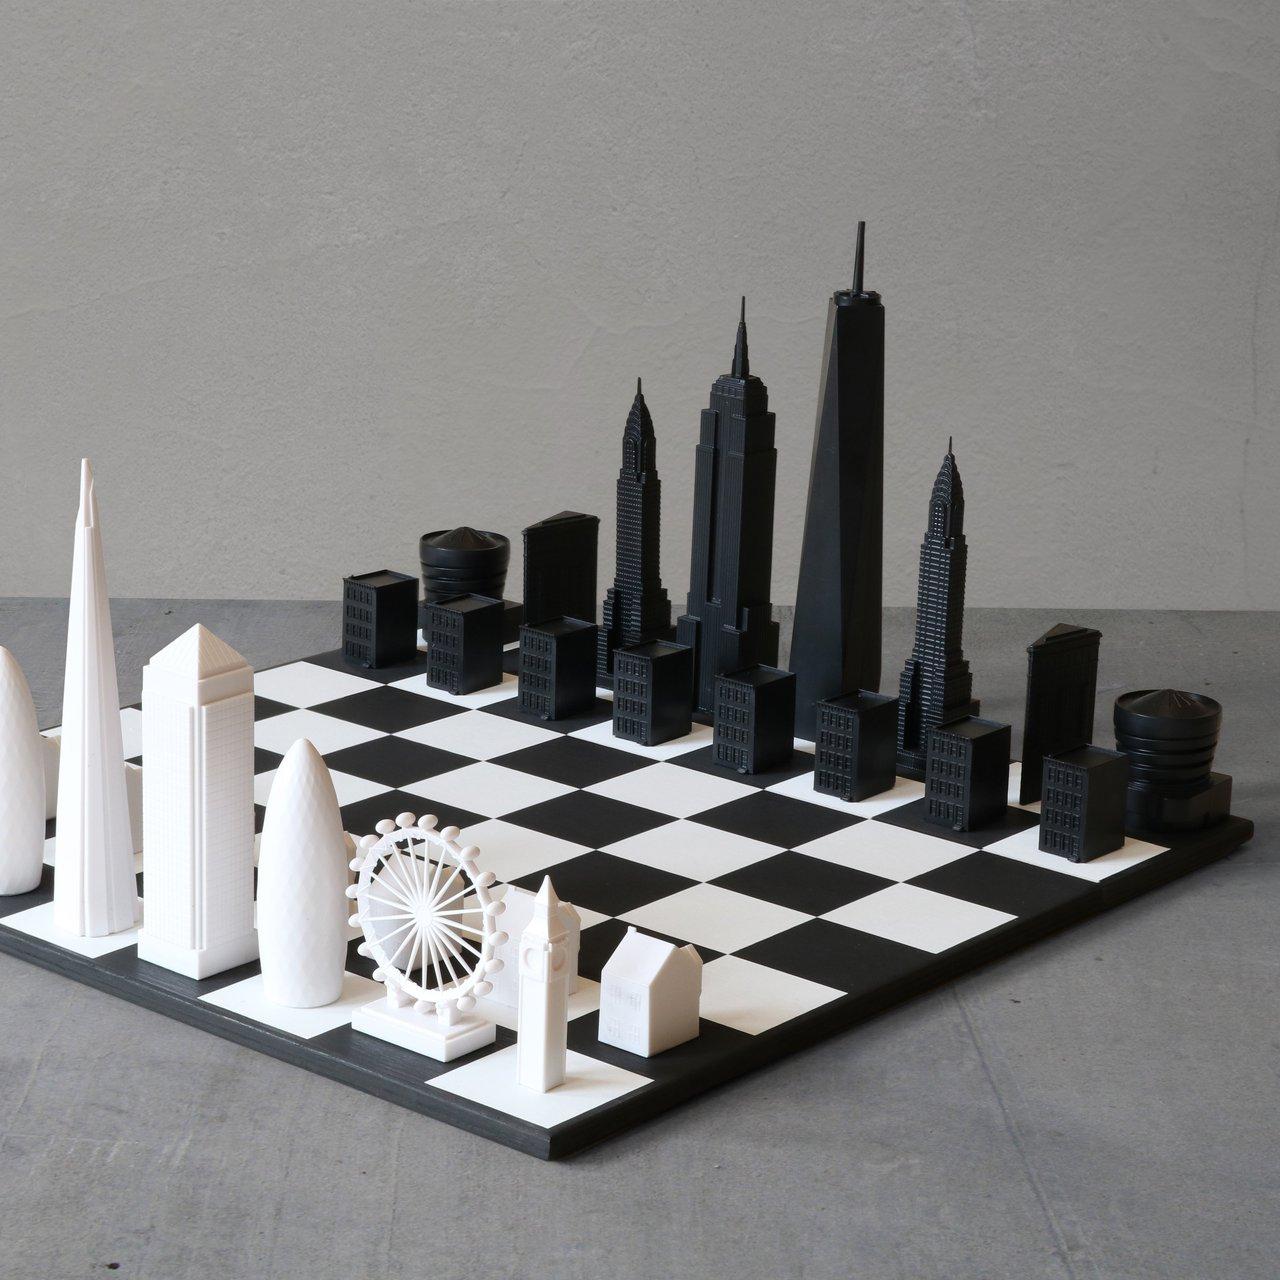 New York Vs London Skyline Chess Set 187 Petagadget